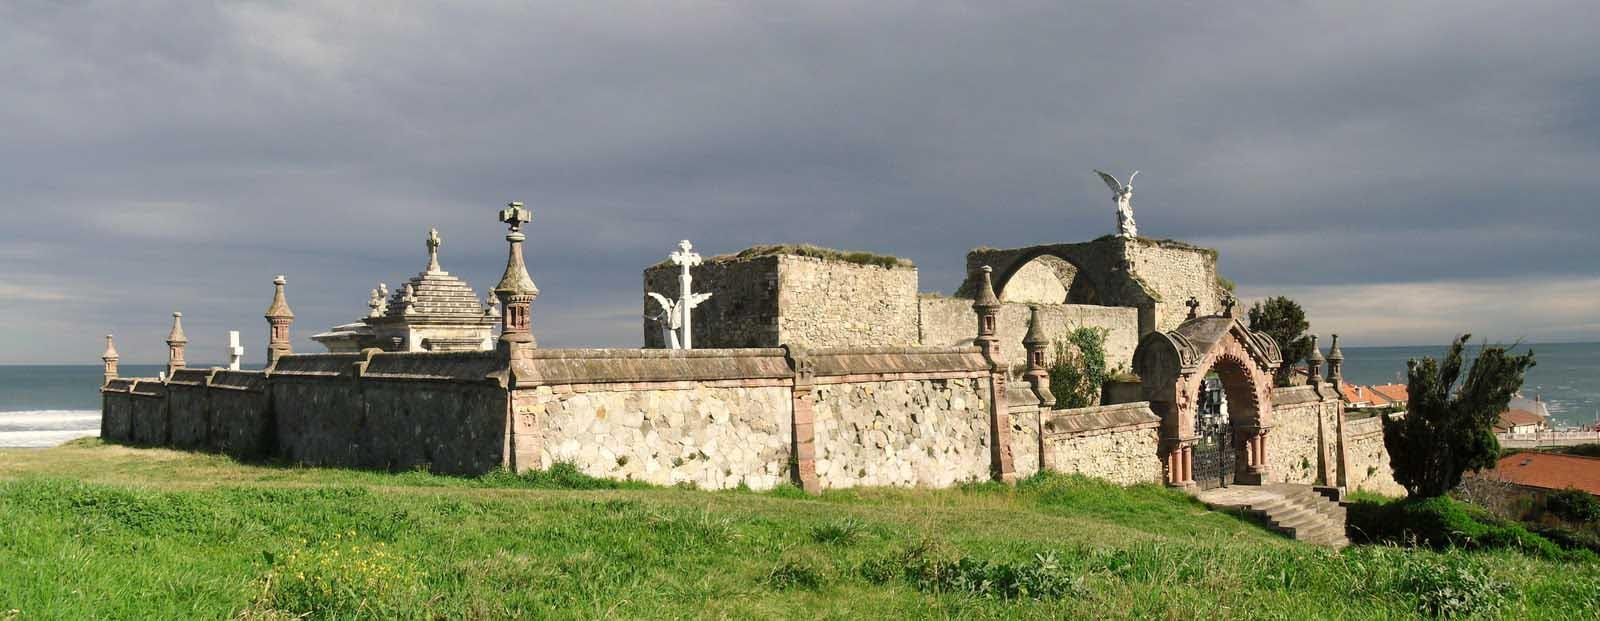 cementerio-de-comillas